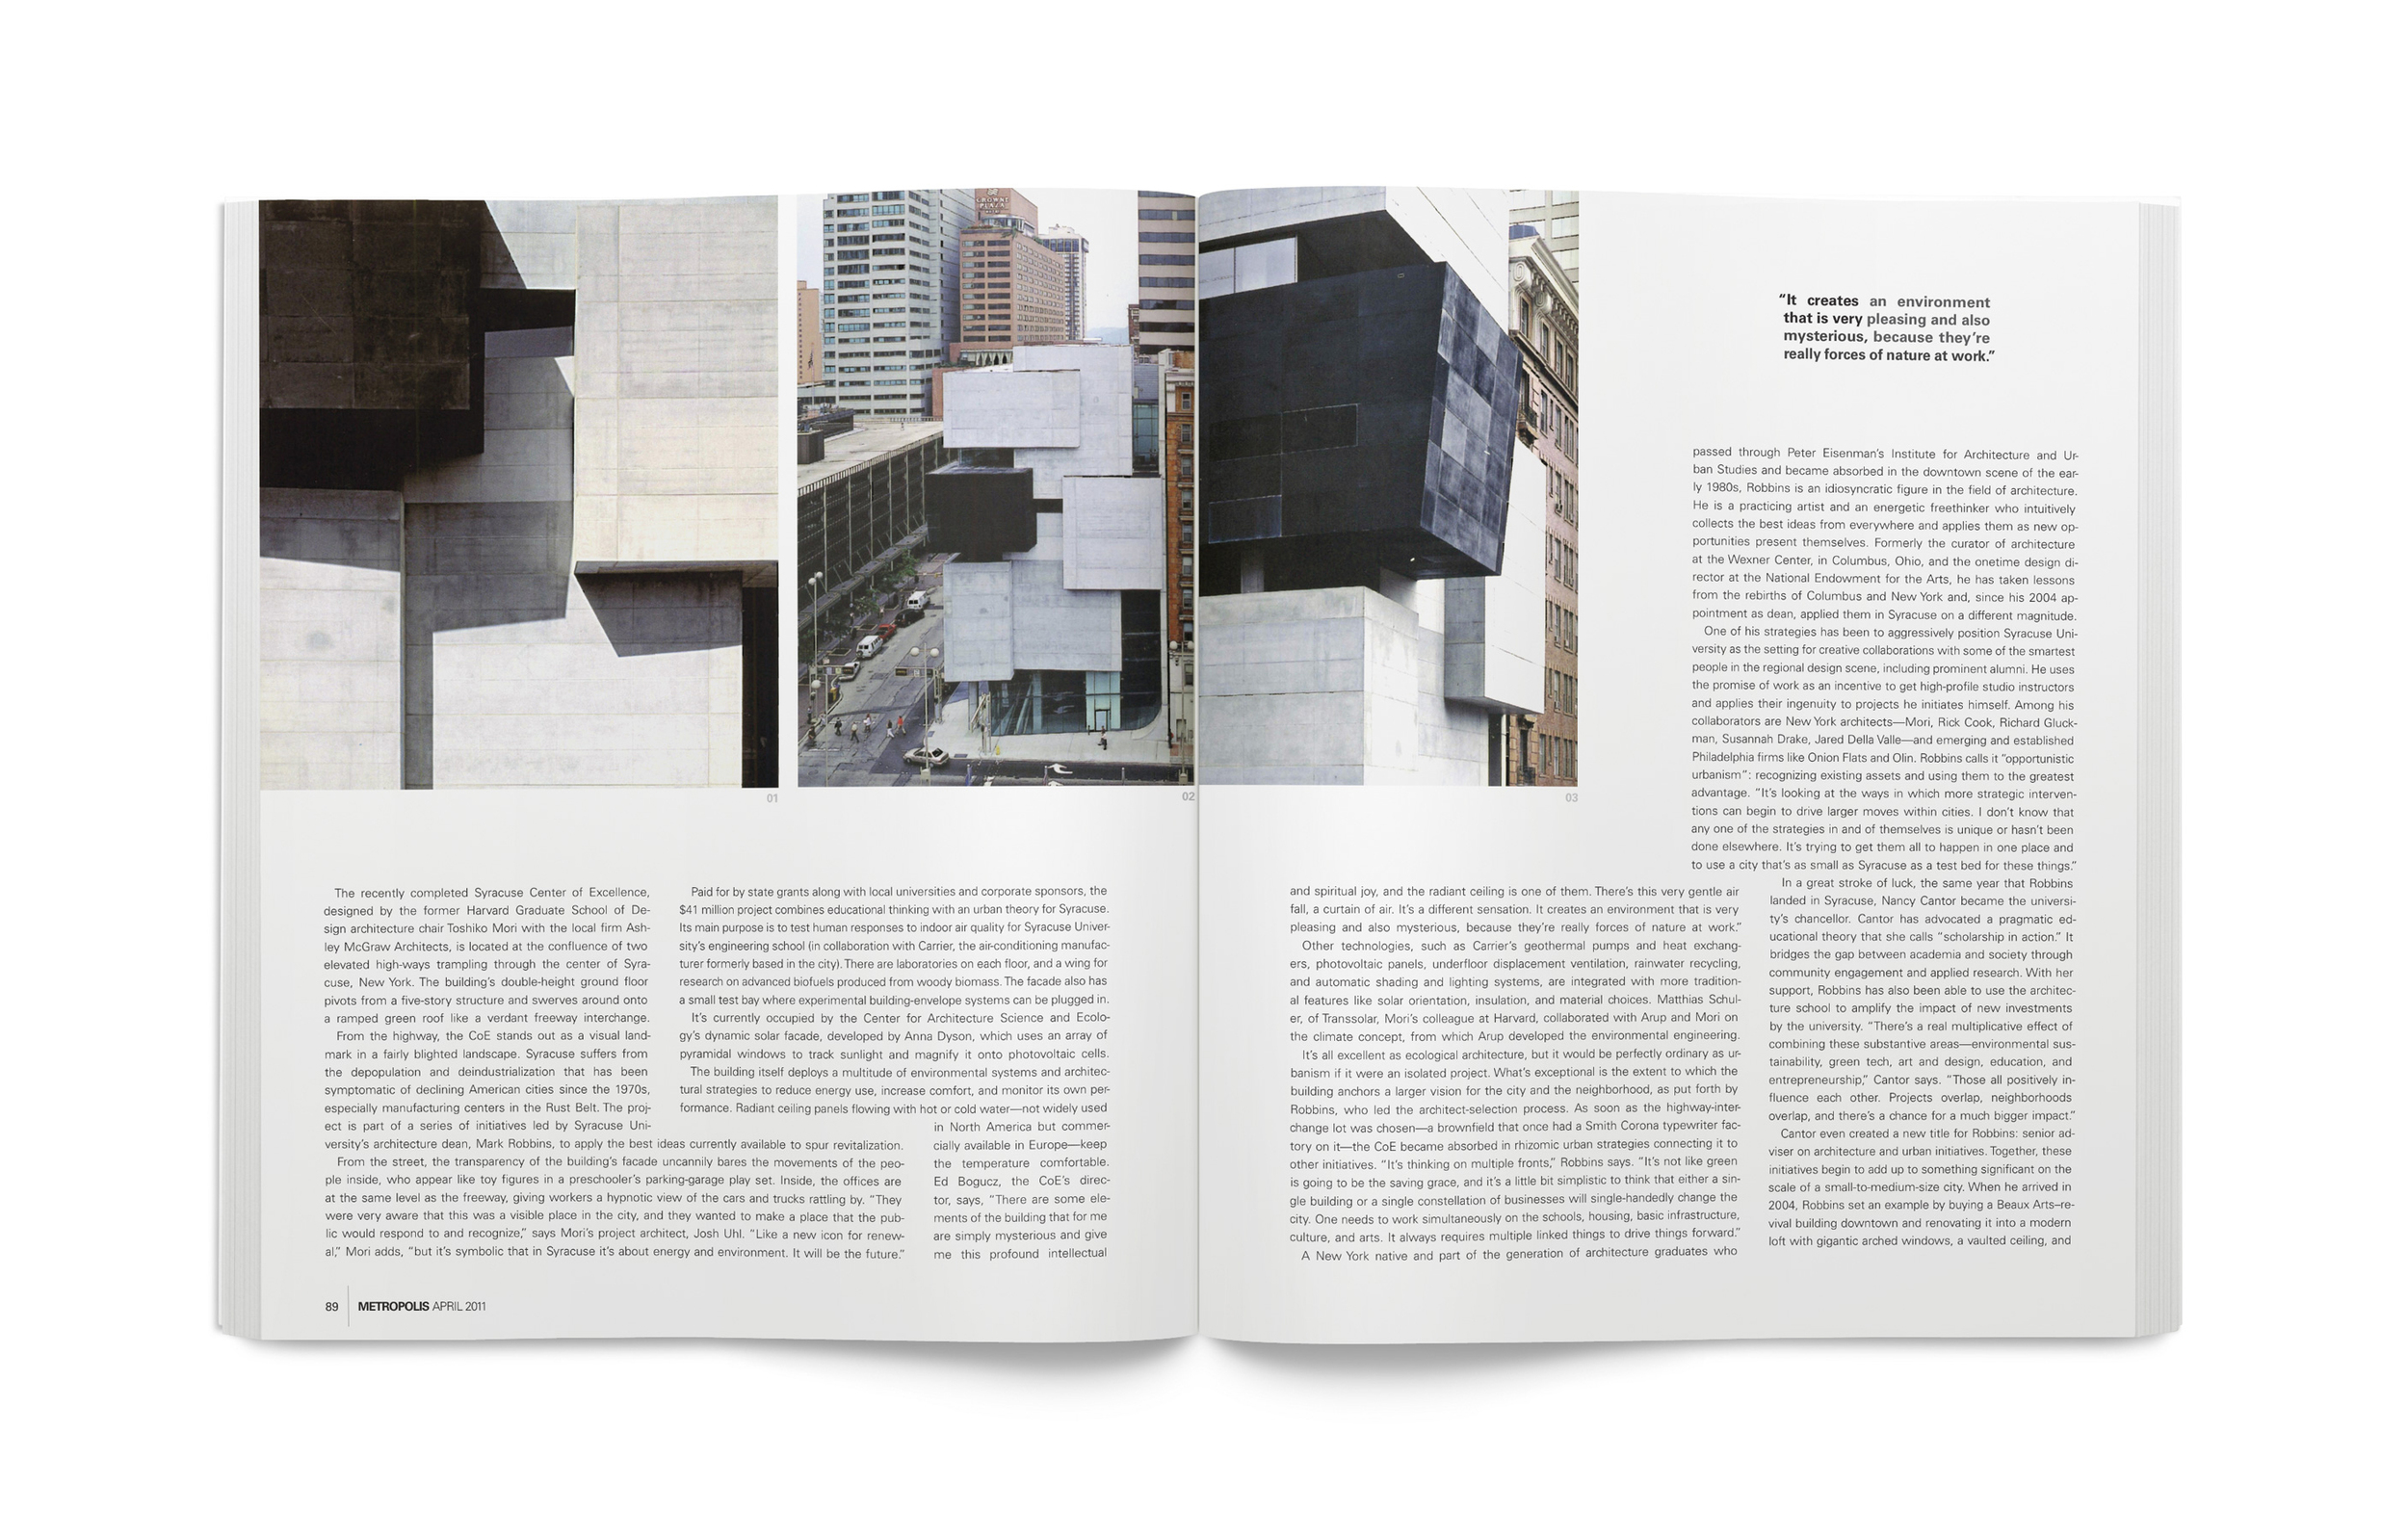 Metropolis Magazine Redesign — Algrthm Design Co  | Las Vegas